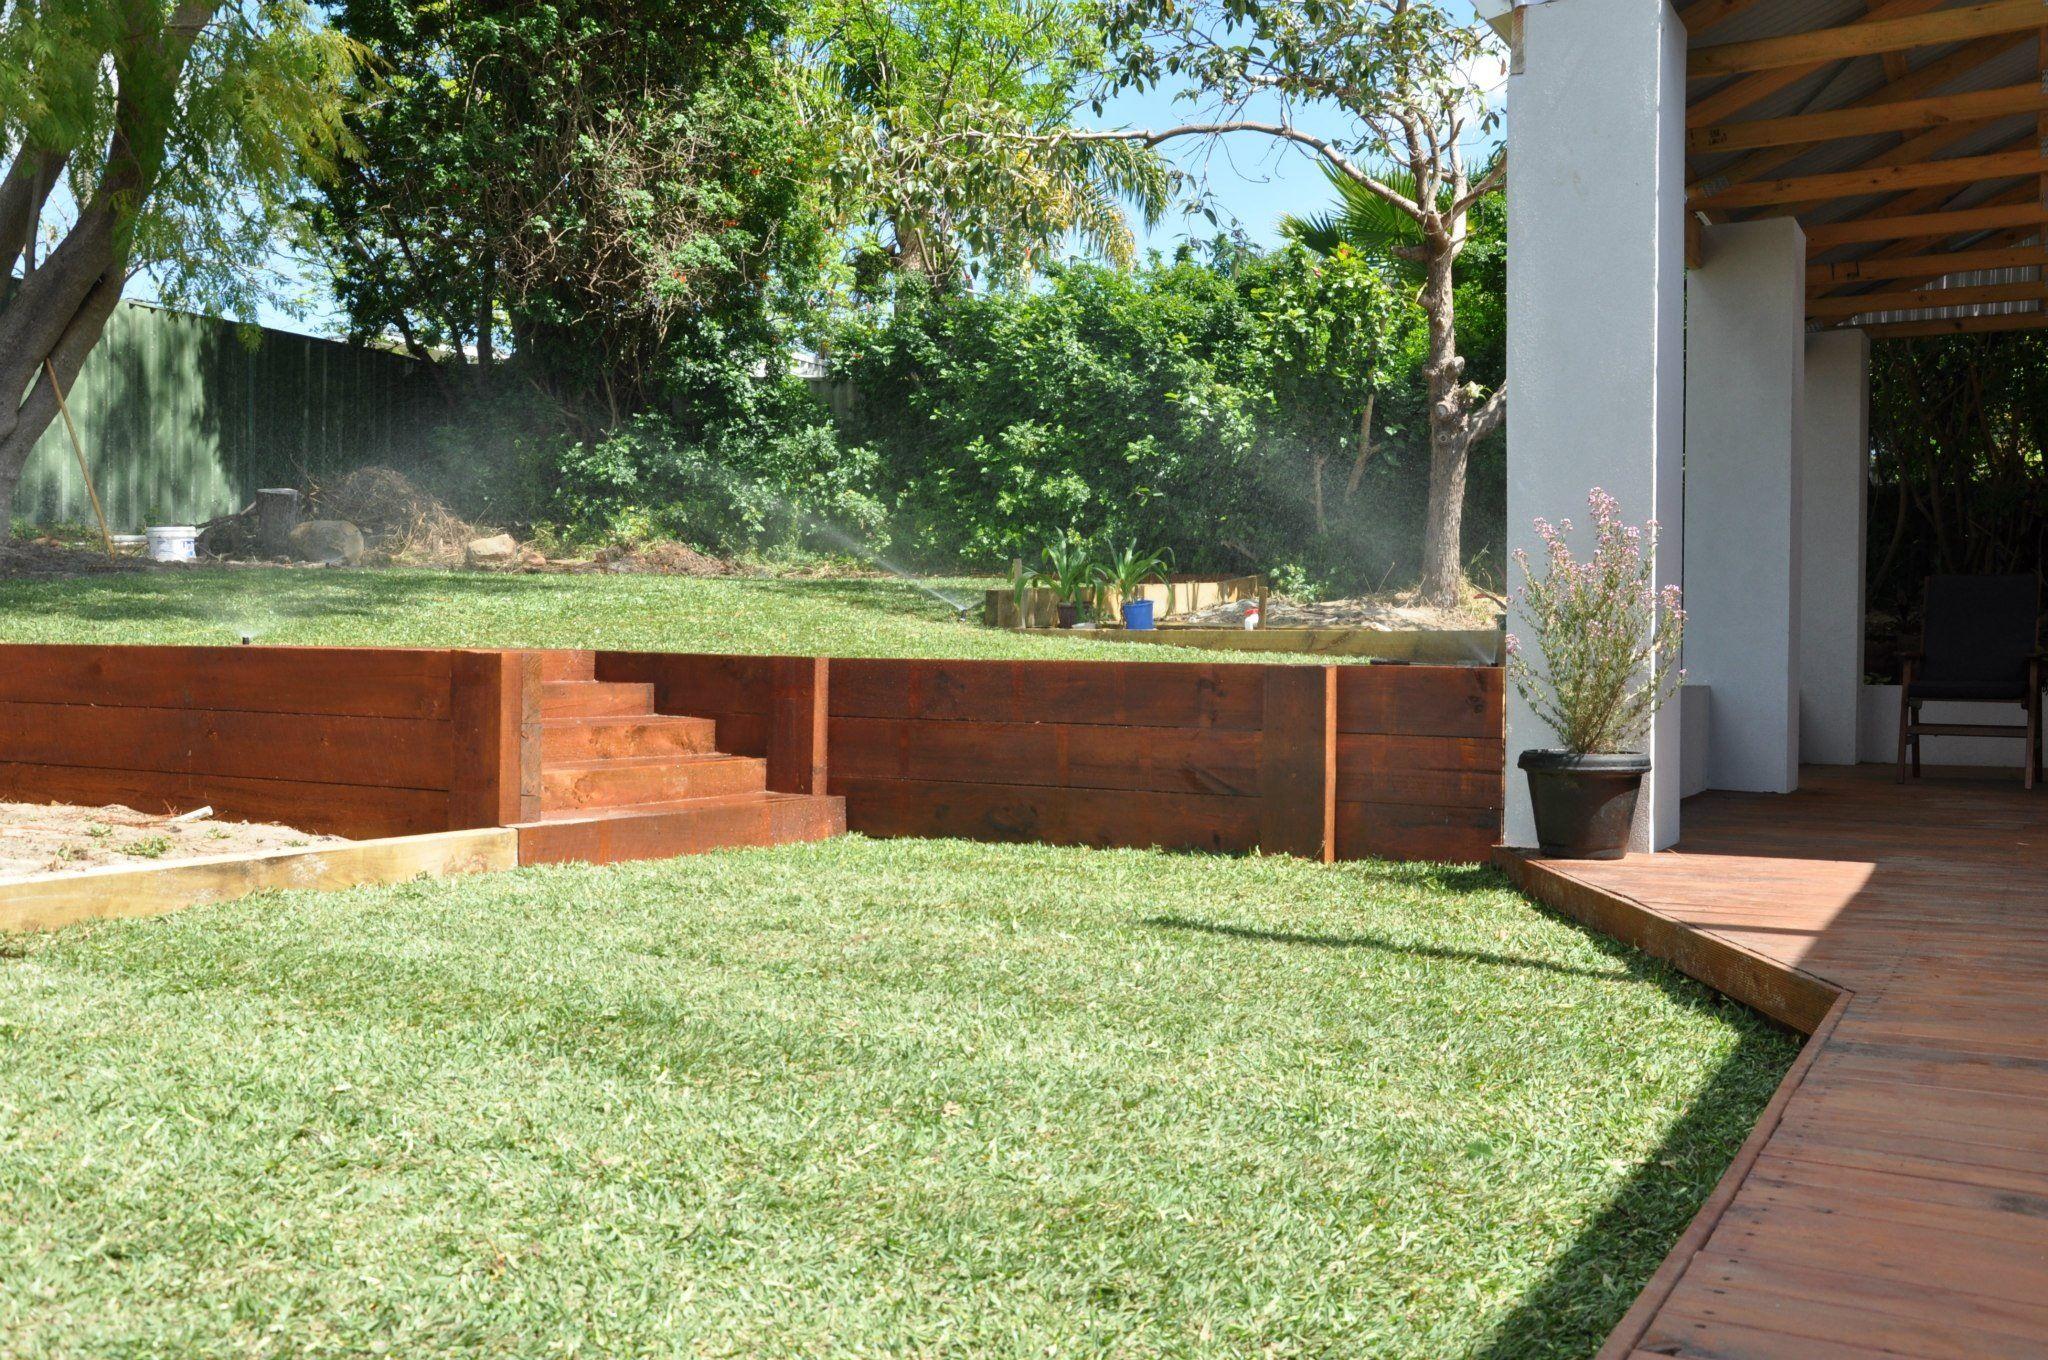 patio designs the usage of pavers